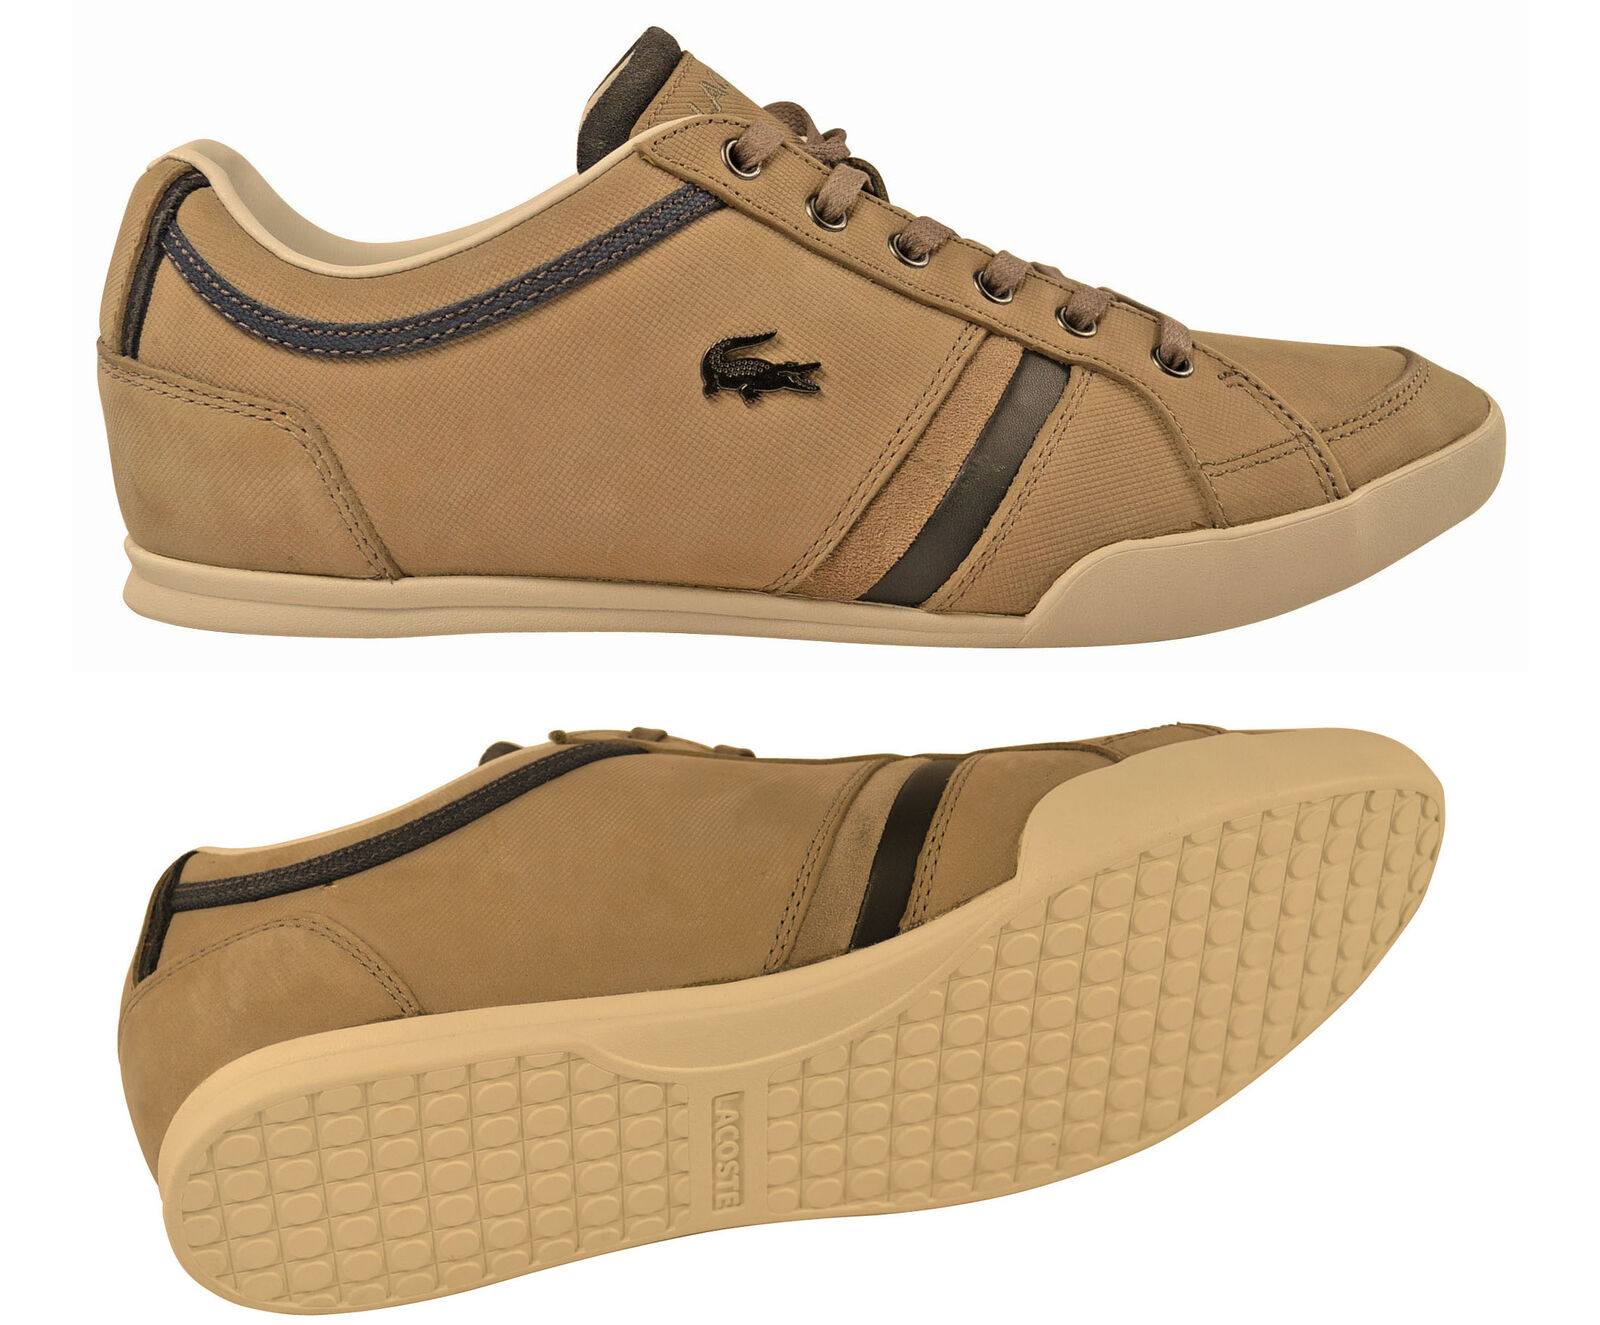 Lacoste Rayford 4 SRM LT brown Schuhe Sneaker braun Gr. 46.5